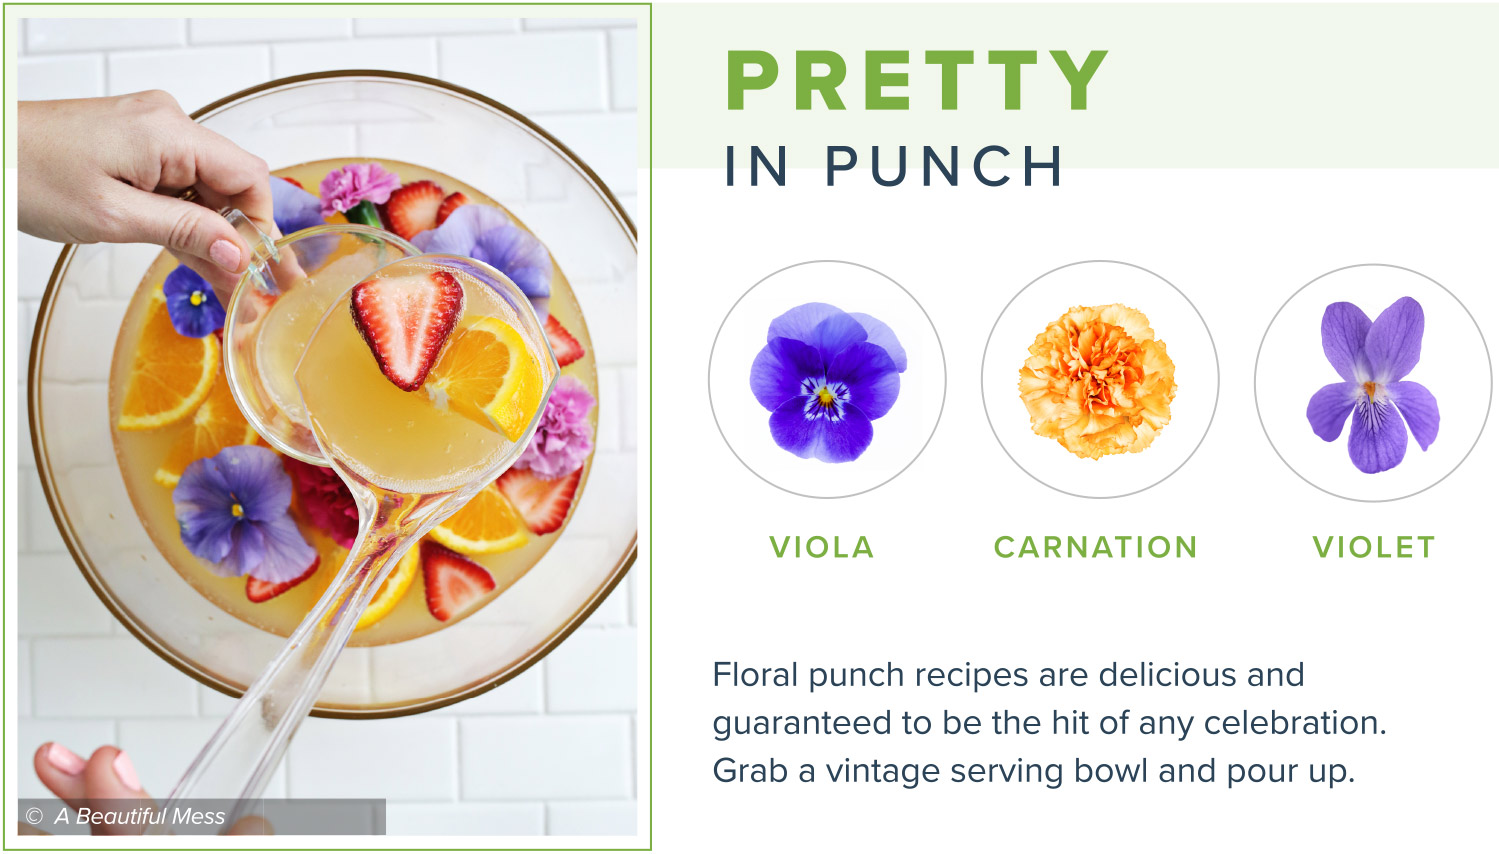 edible flowers pretty in punch